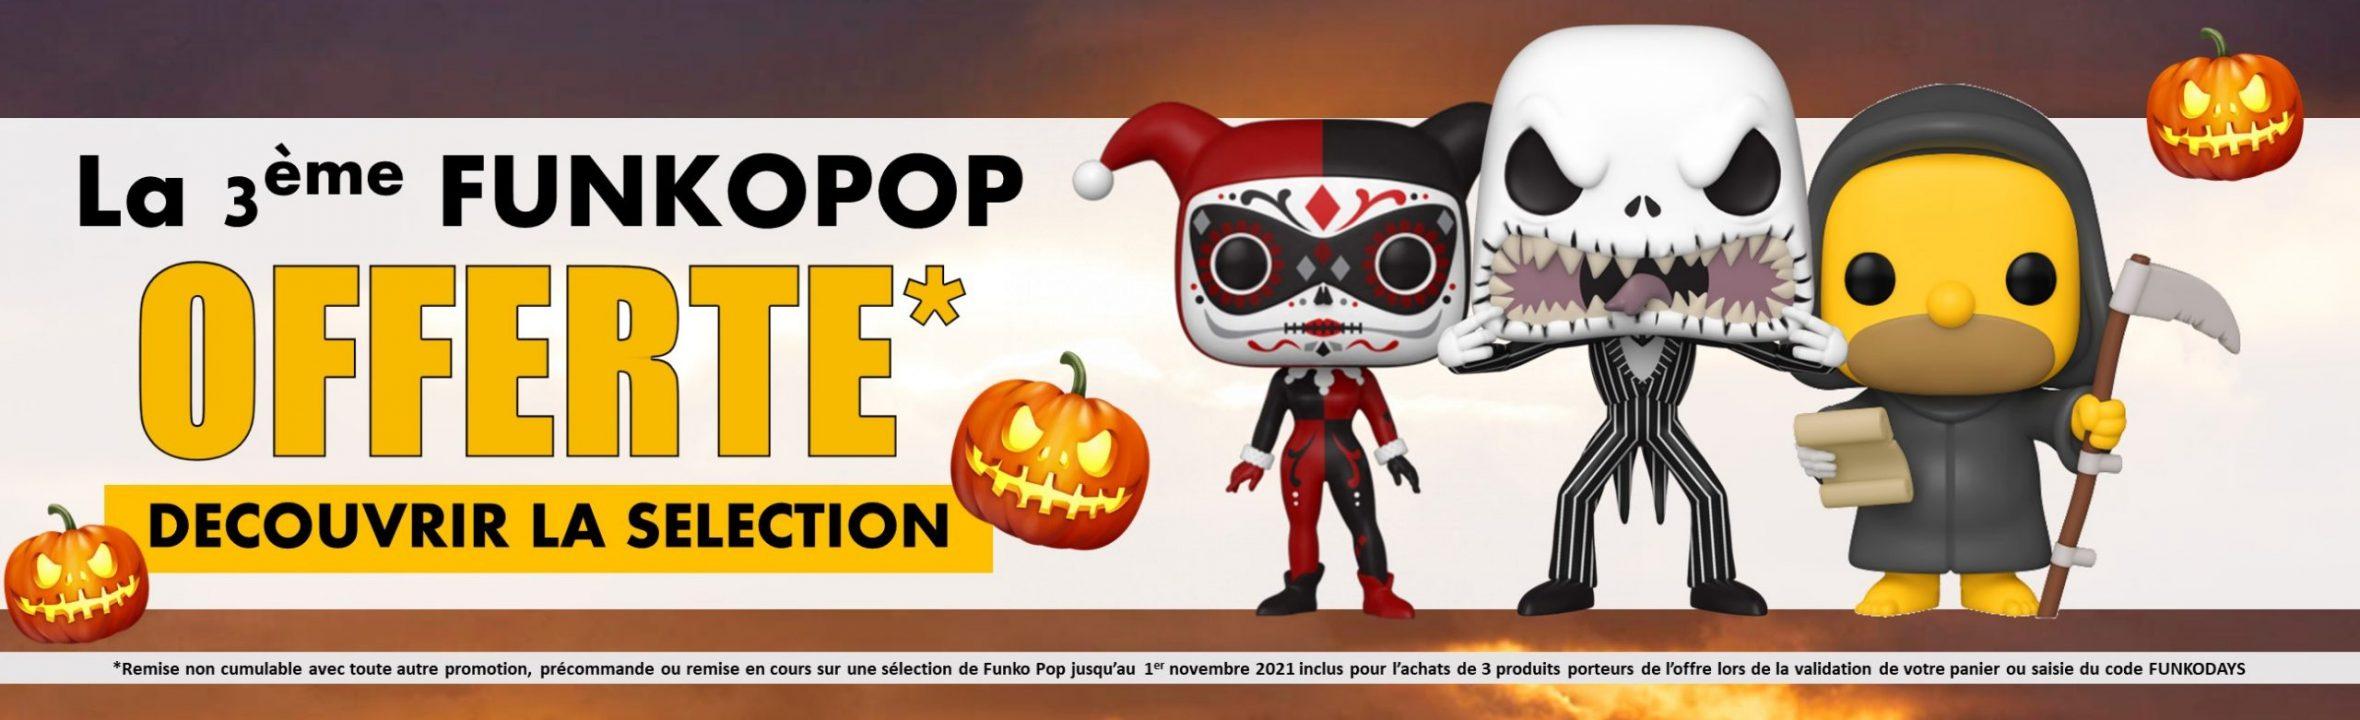 funko days 3ème pop offerte halloween 2021 goodin shop